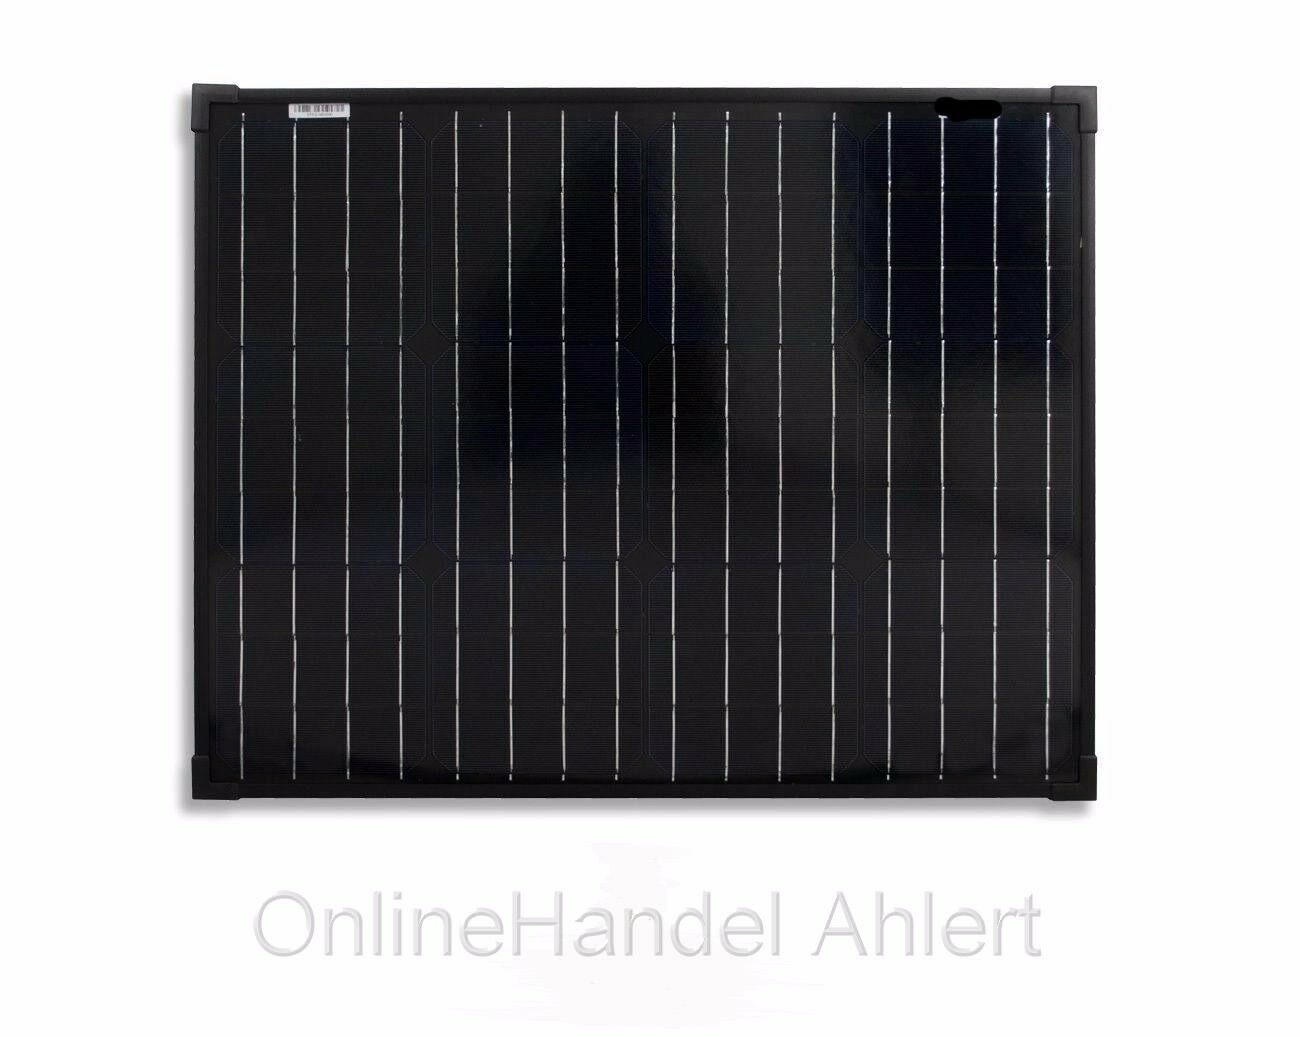 50w solarpumpe teichpumpe gartenteichpumpe solar teich filter springbrunnen eur 184 95. Black Bedroom Furniture Sets. Home Design Ideas